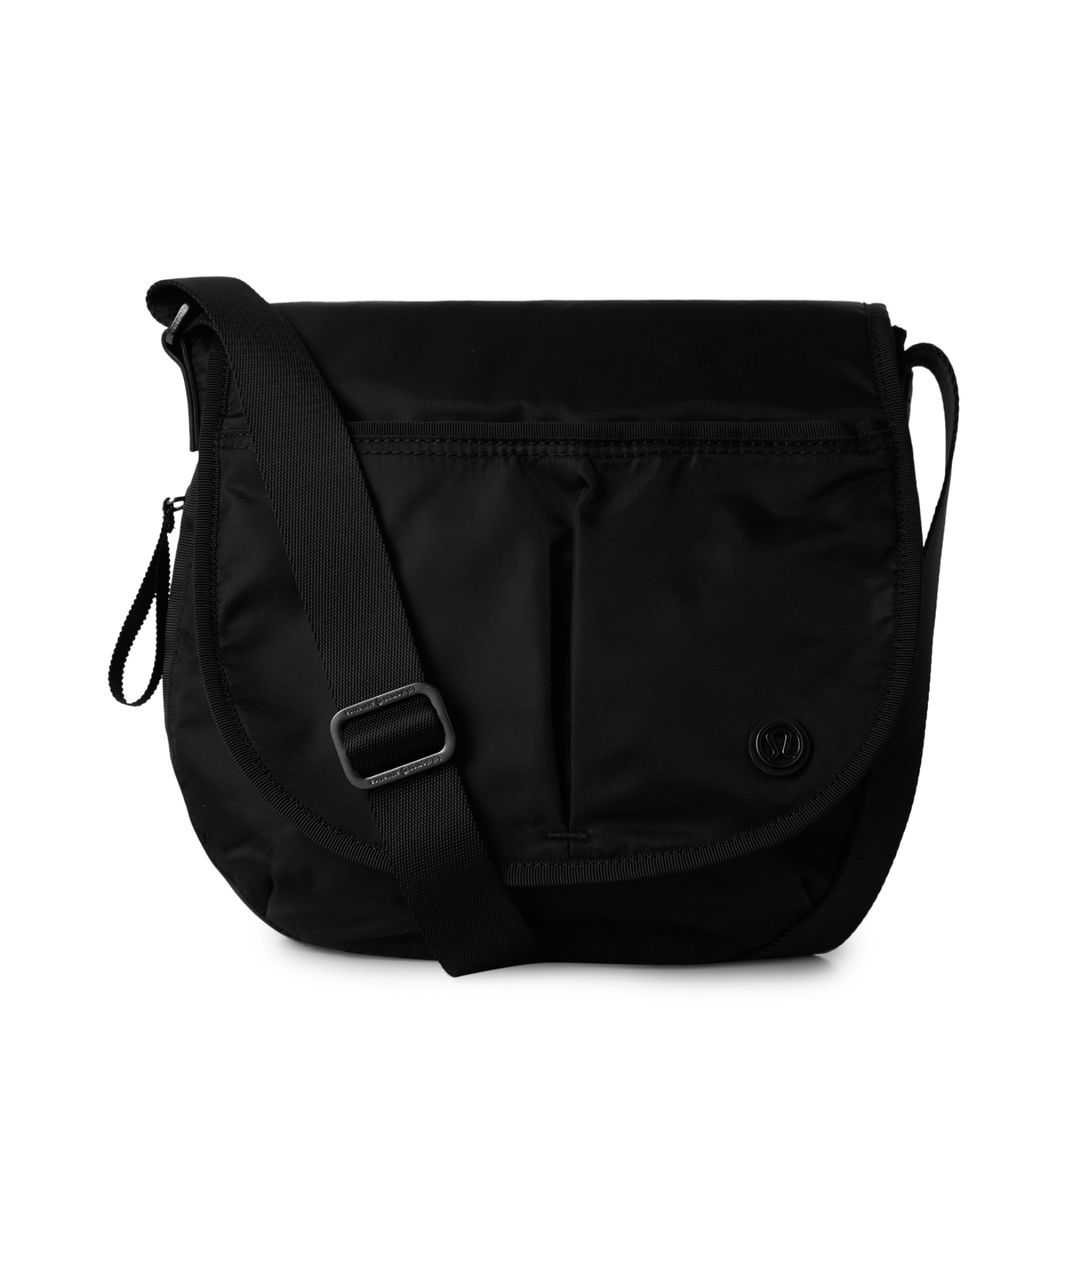 Lululemon The Essentials Bag Black